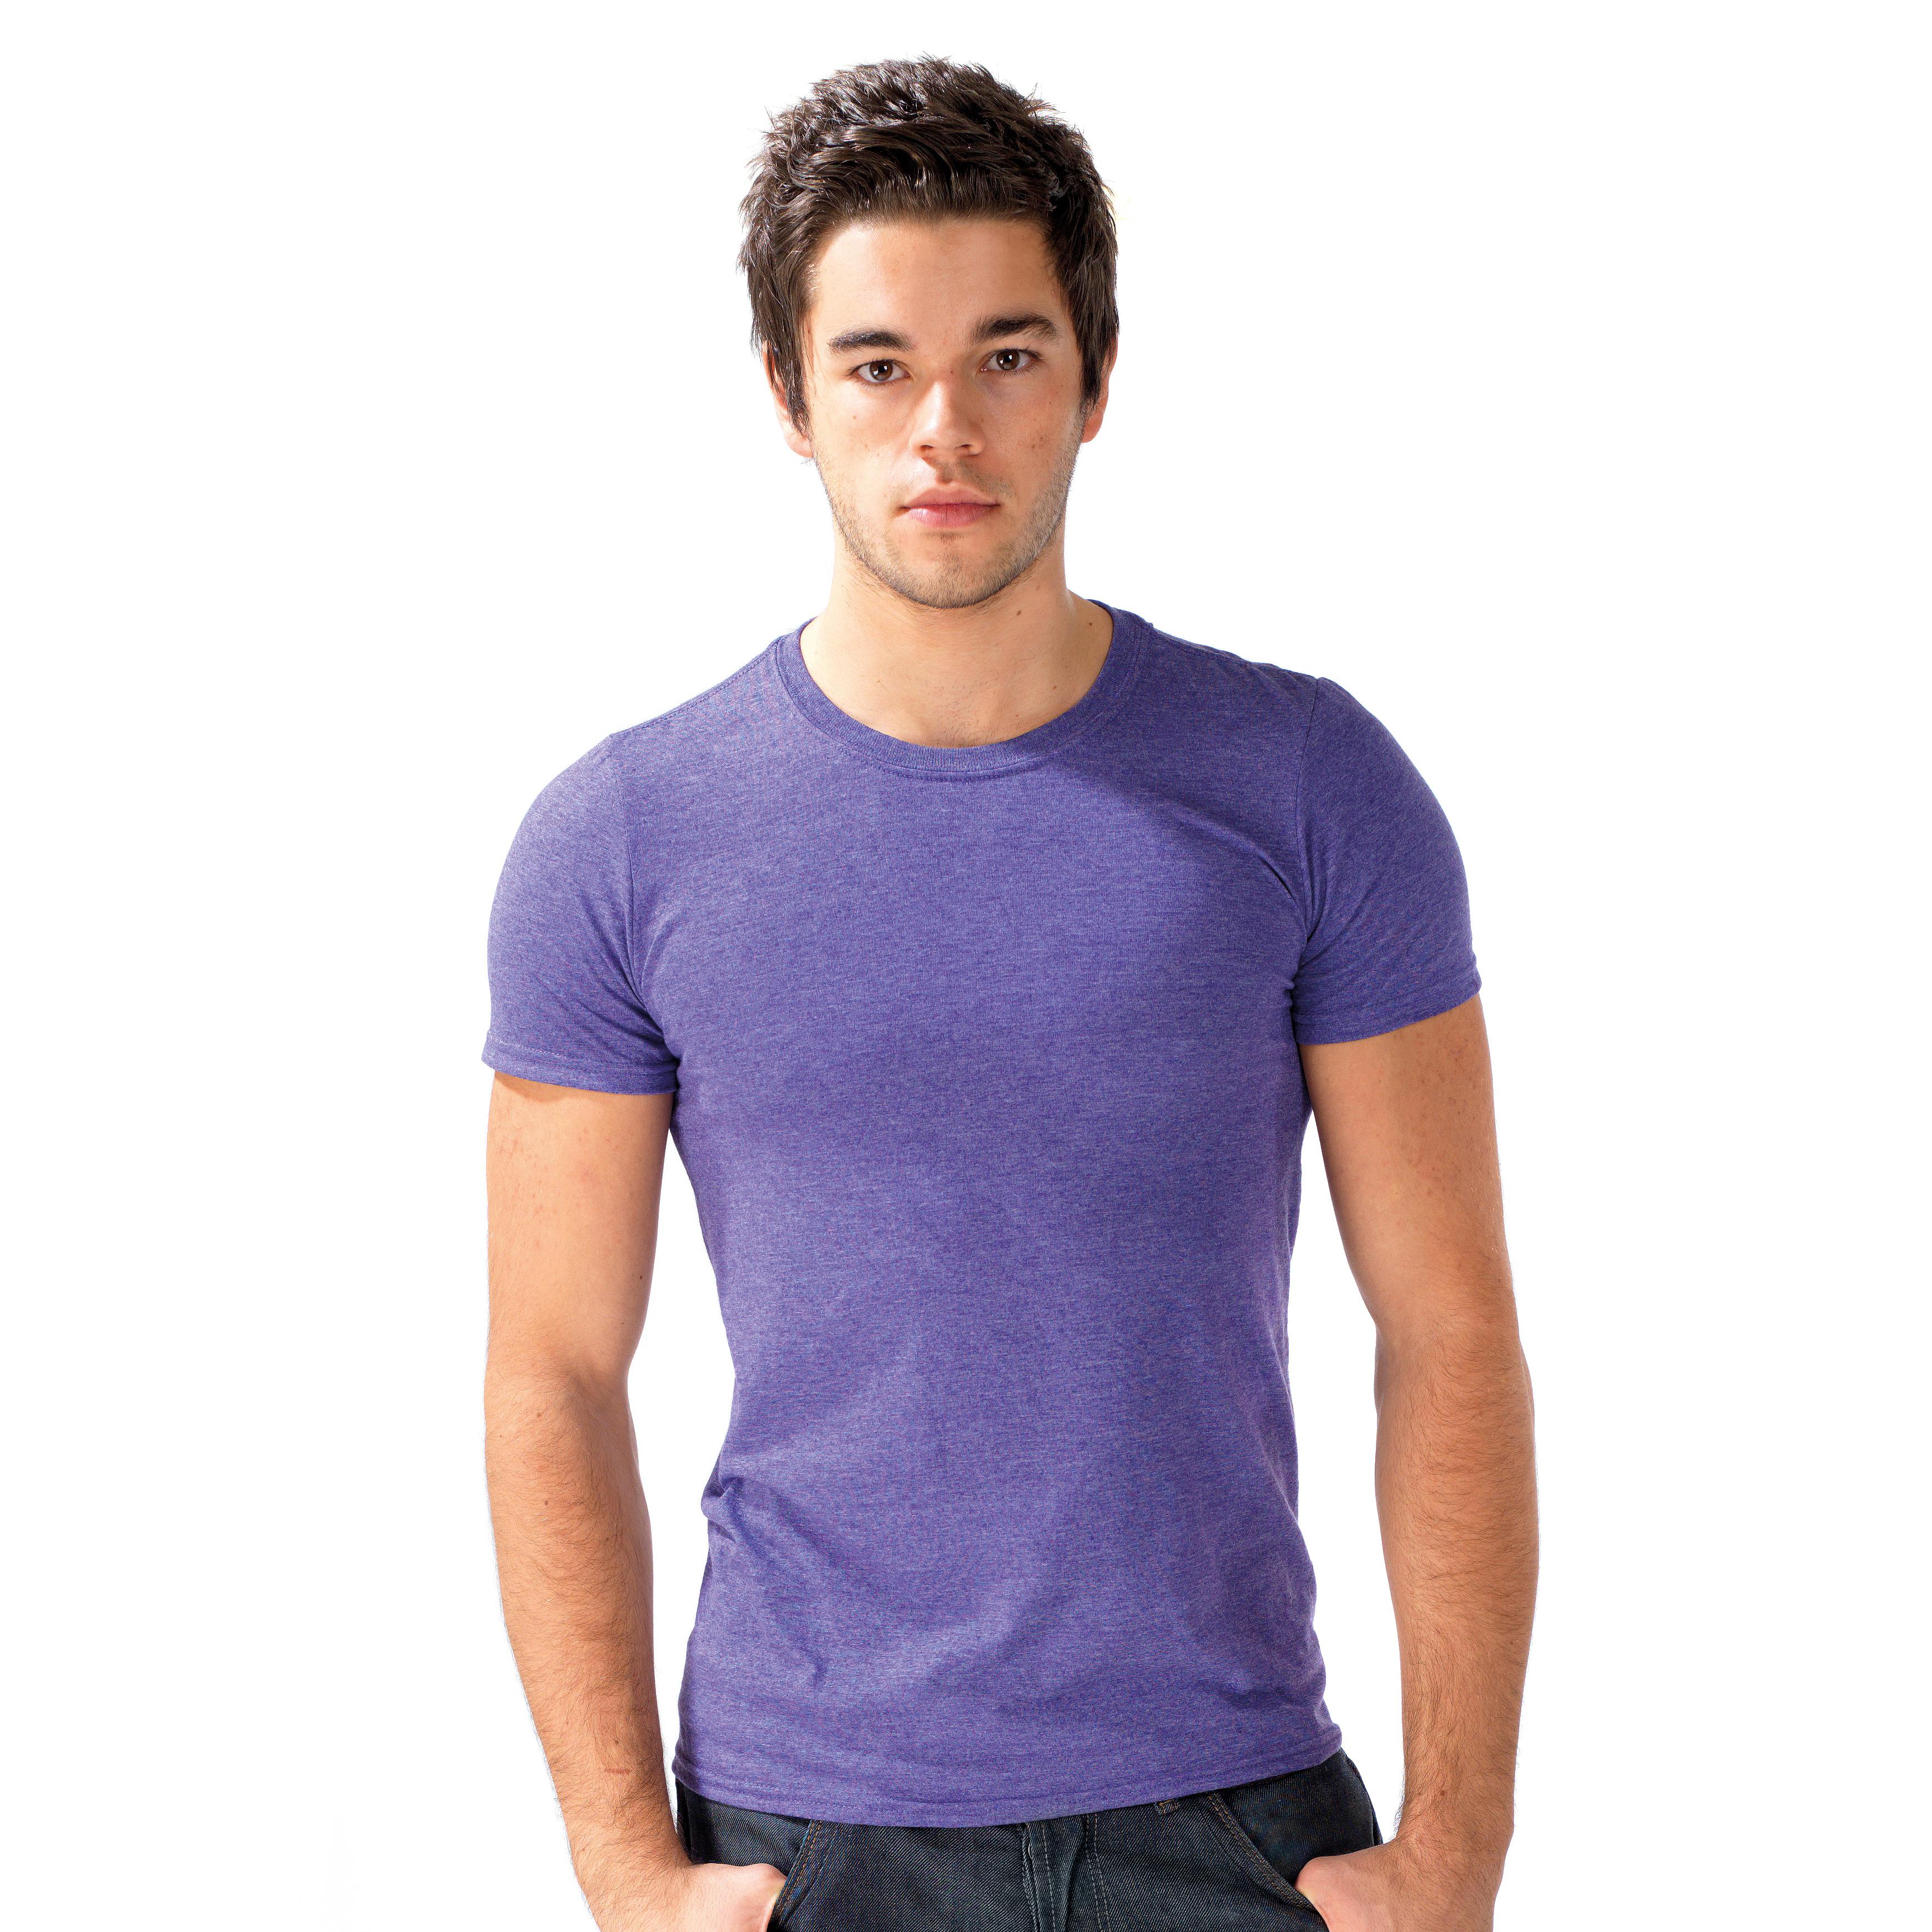 t shirt printing uk reviews